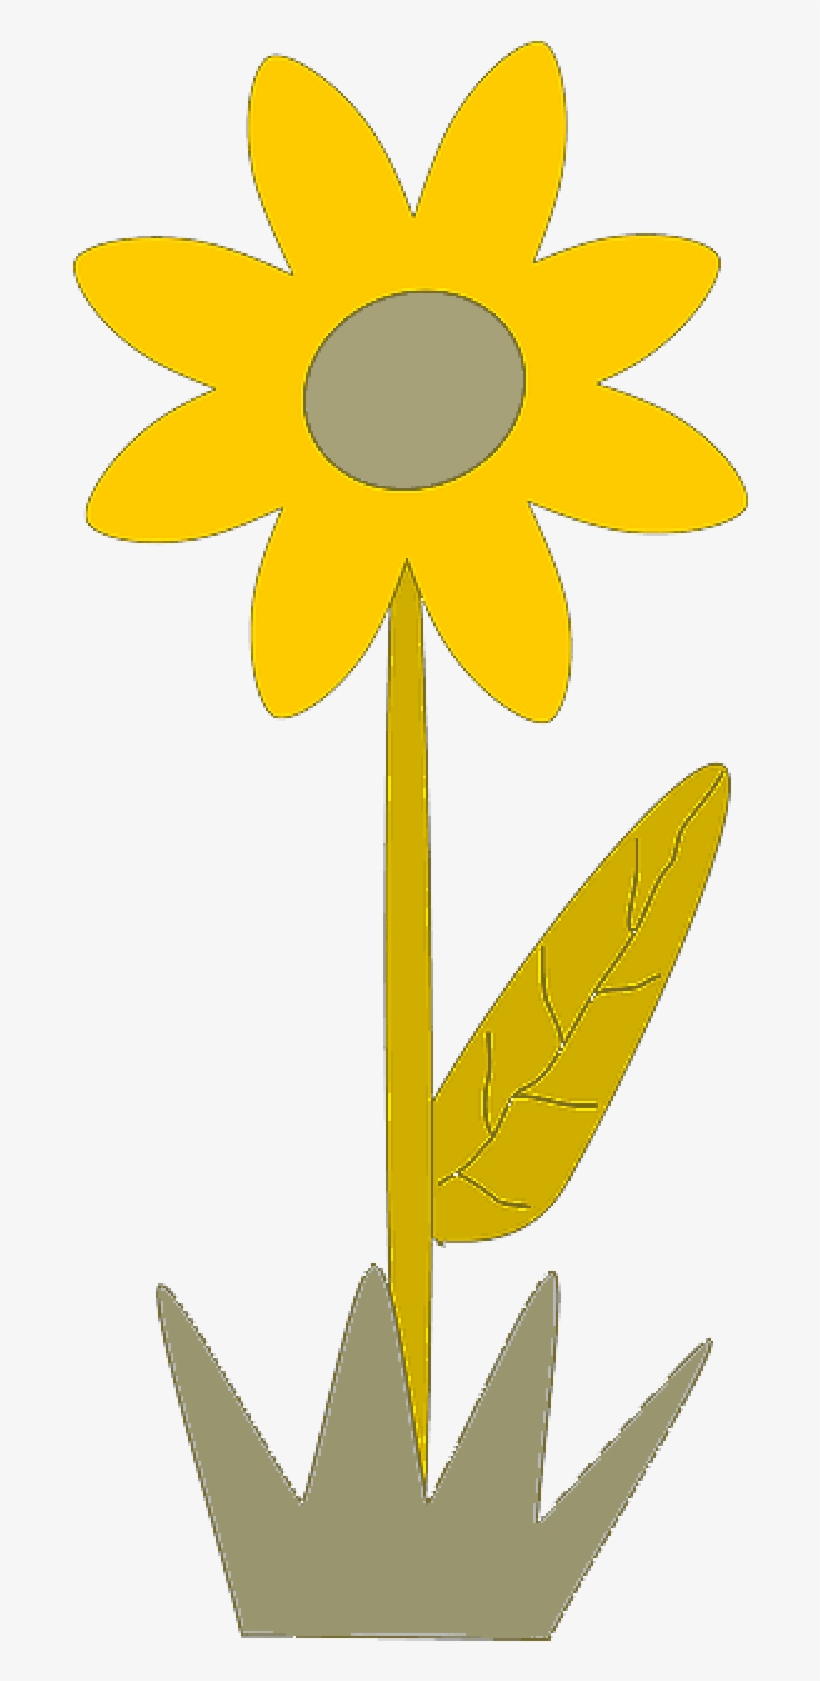 Mb Image/png - Spring Flowers Clip Art, transparent png #1357260